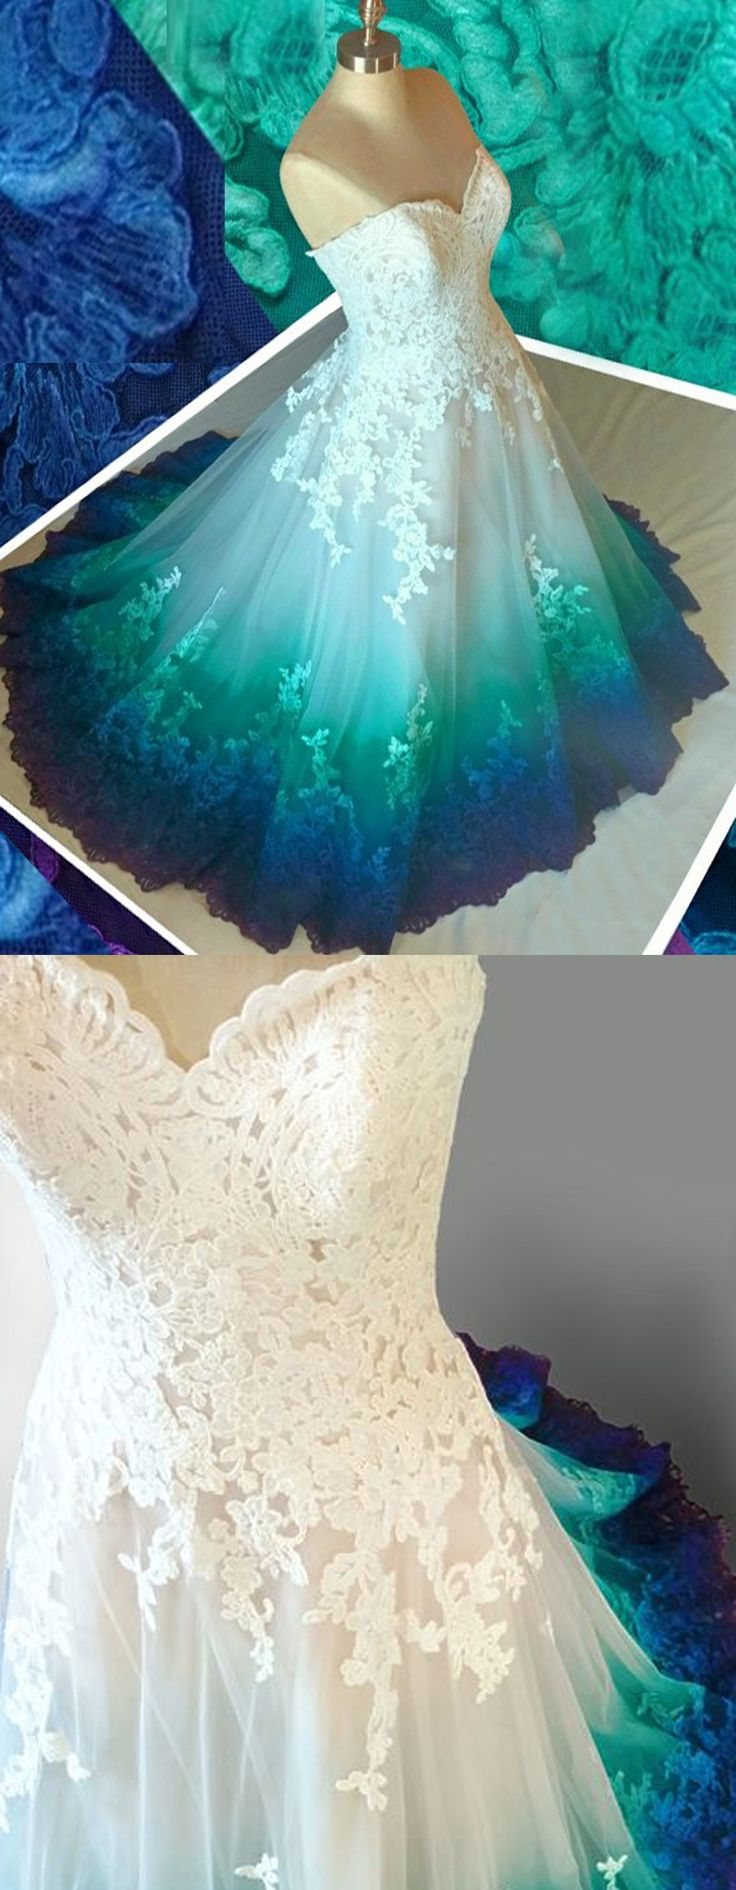 best future wedding images on pinterest gown wedding dream